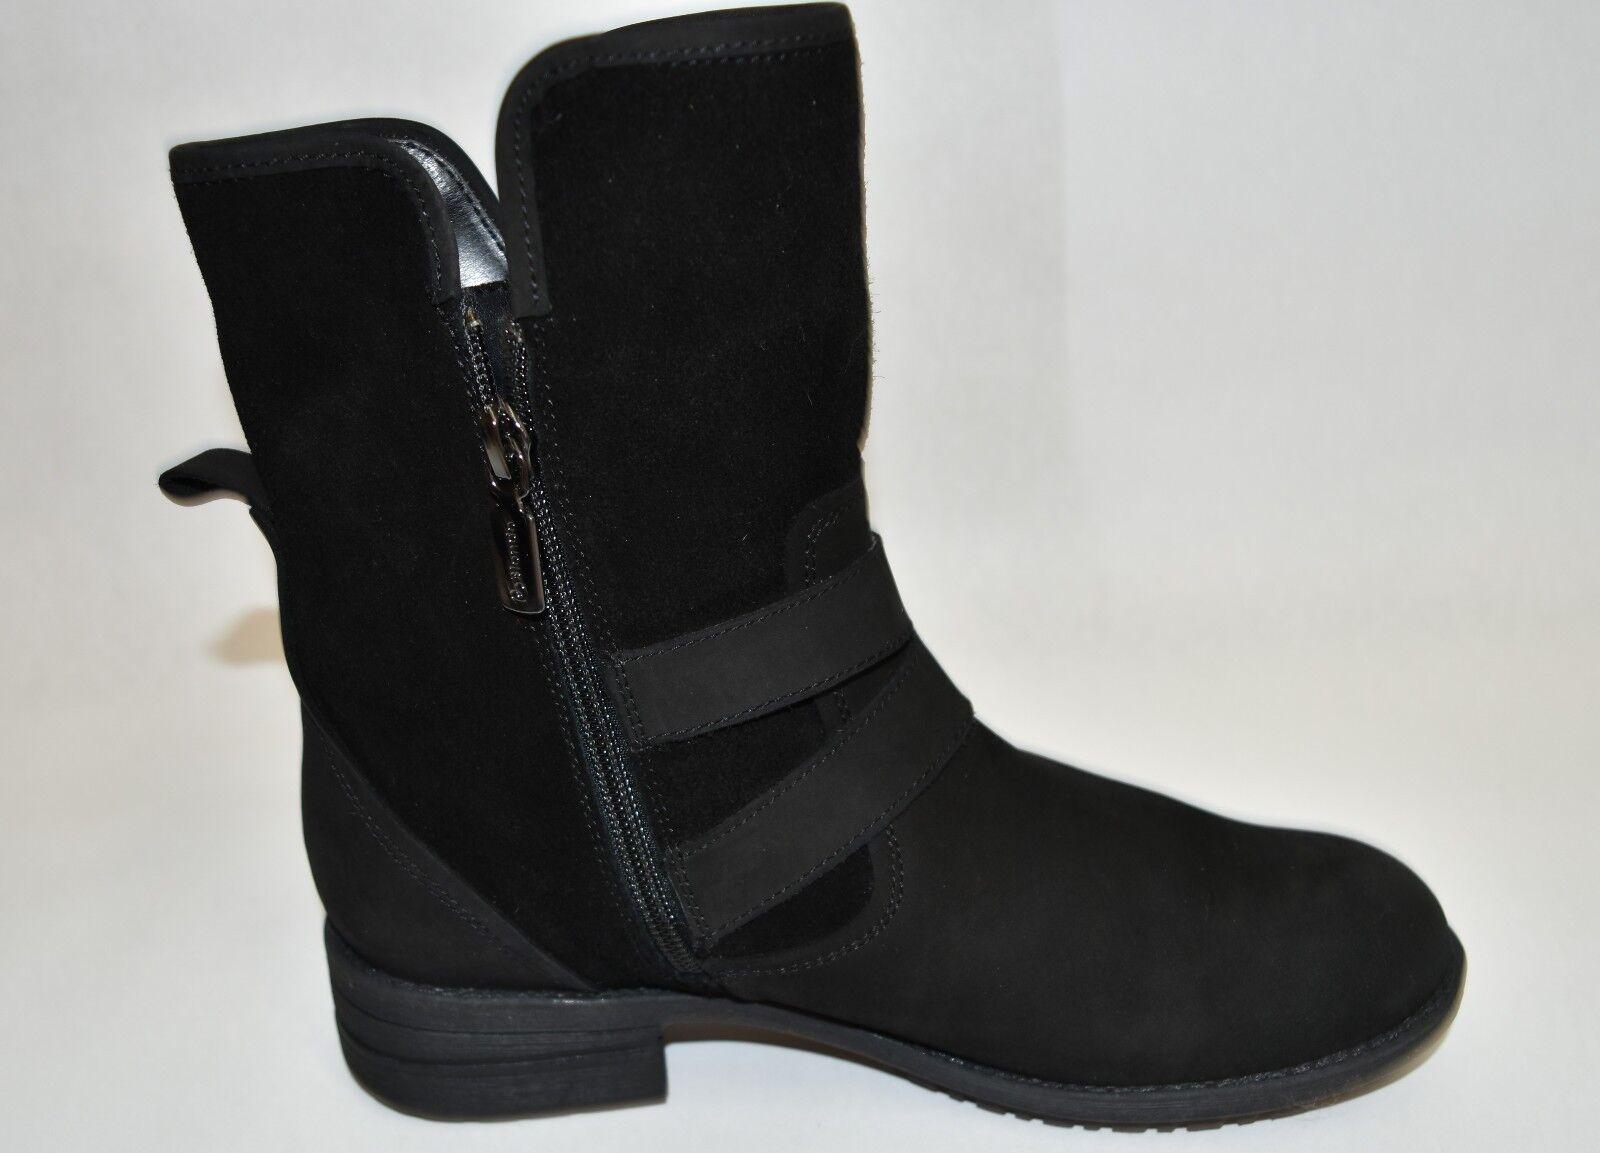 Blondo 'Tula Waterproof Boot' Boot' Boot' Black Suede Nubuck Size 7.5 M  T26 61afa0